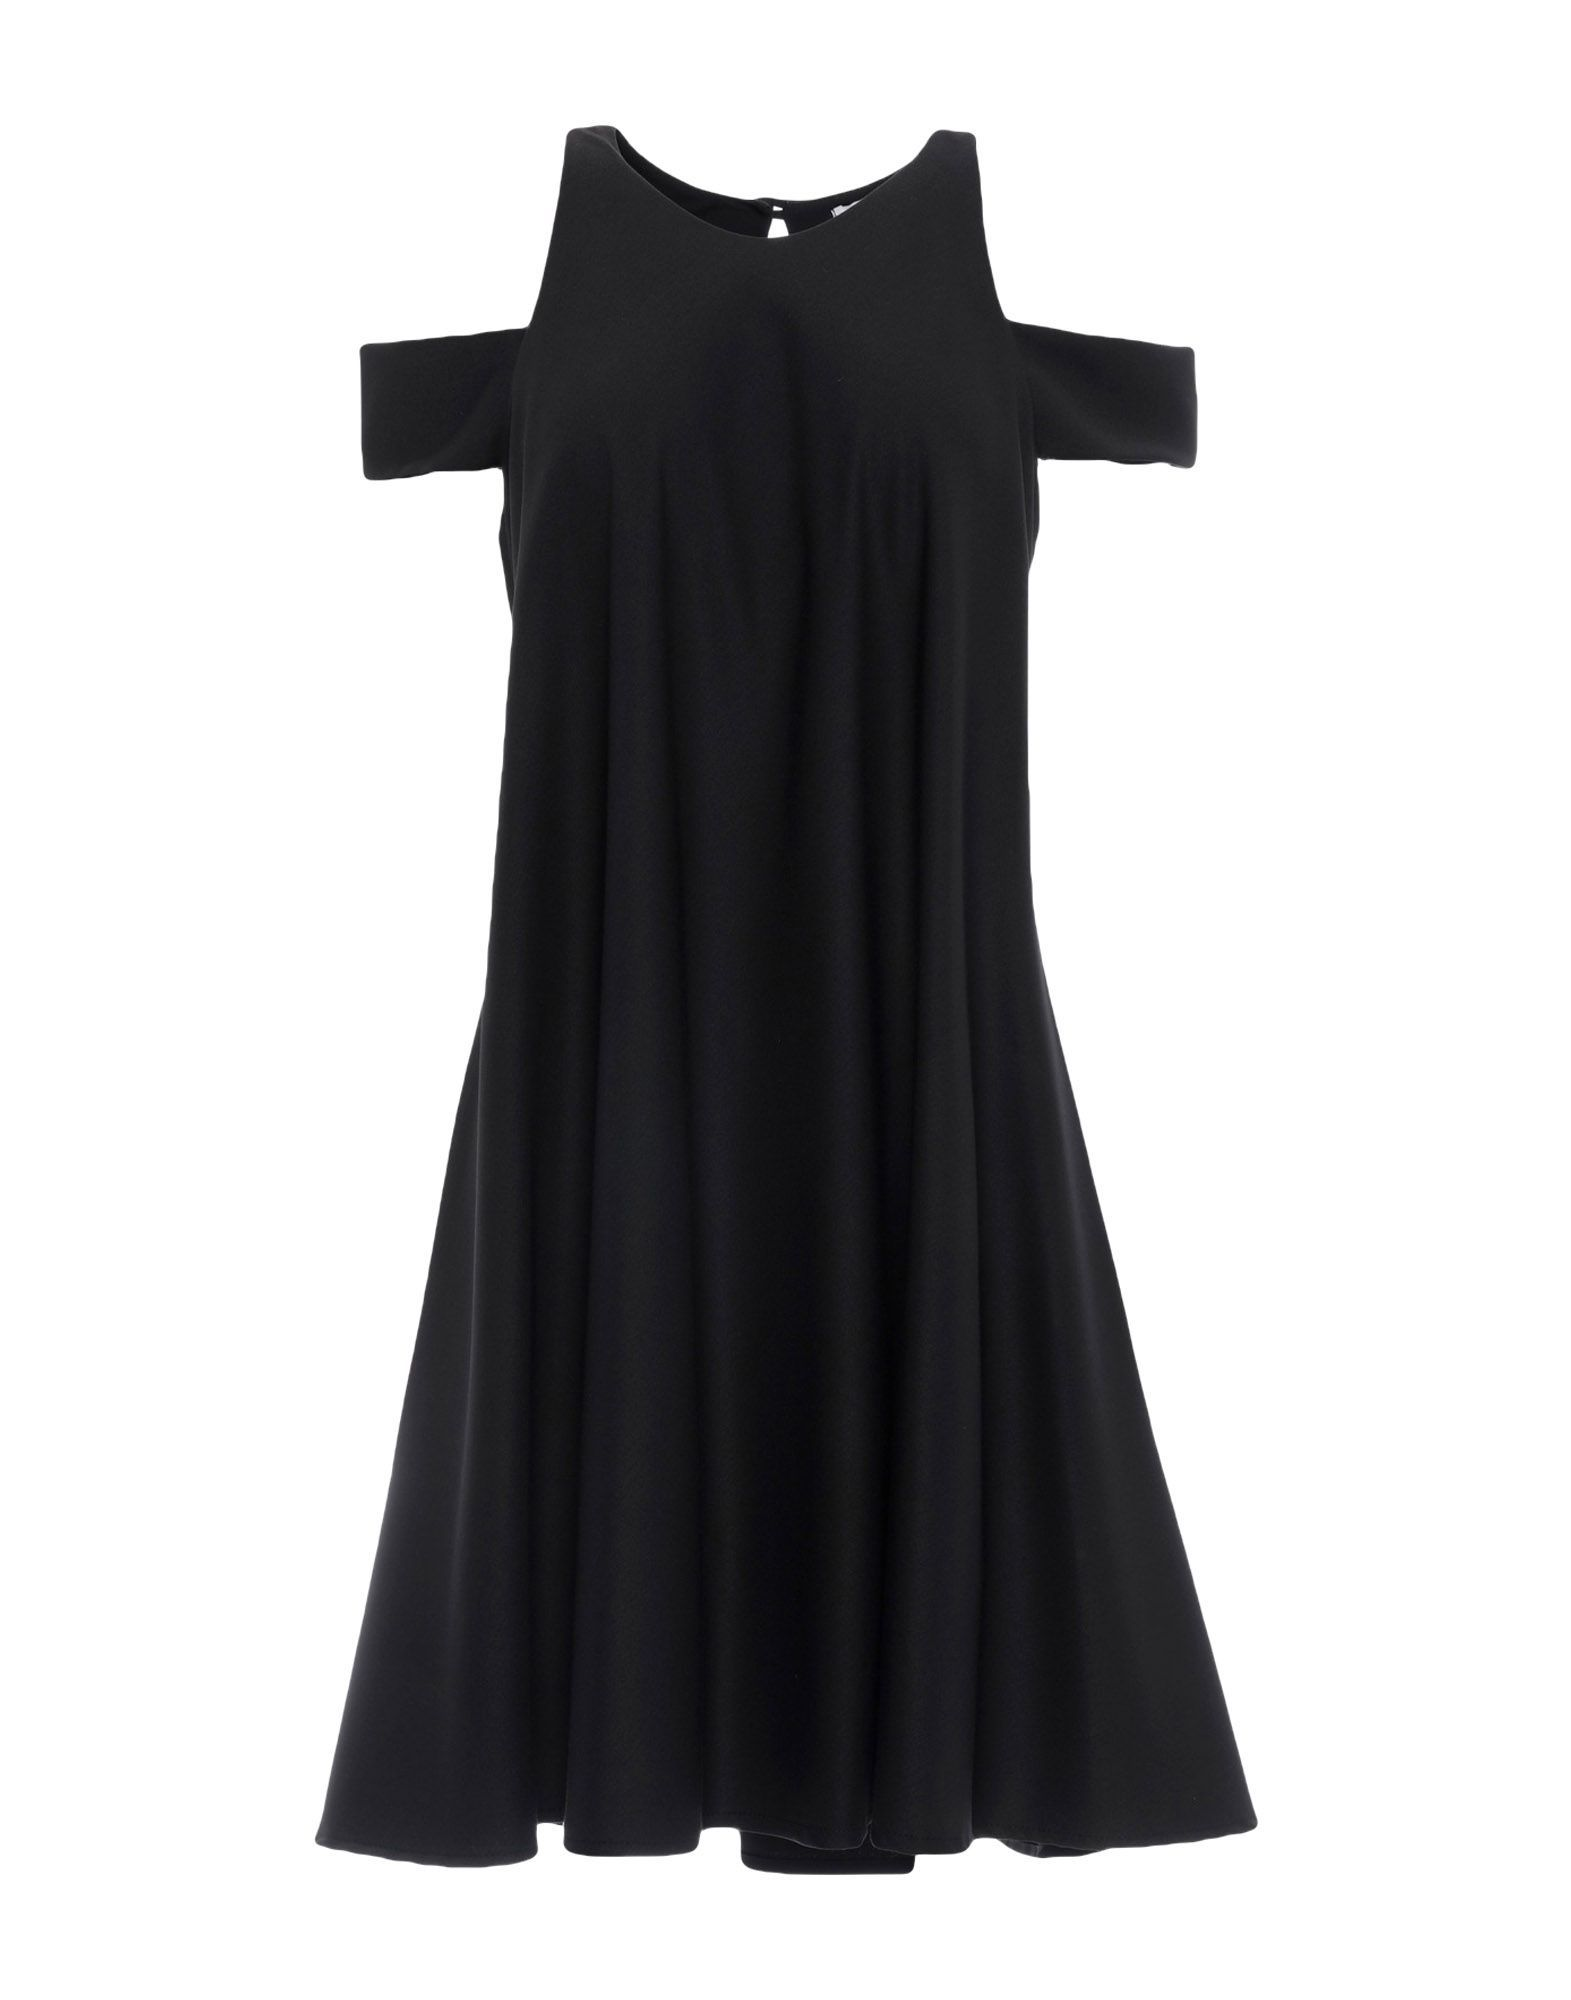 Größe 5Aktivwelt24 Motel Kurzes Schwarz Kleid Damen Farbe OXZiuPk